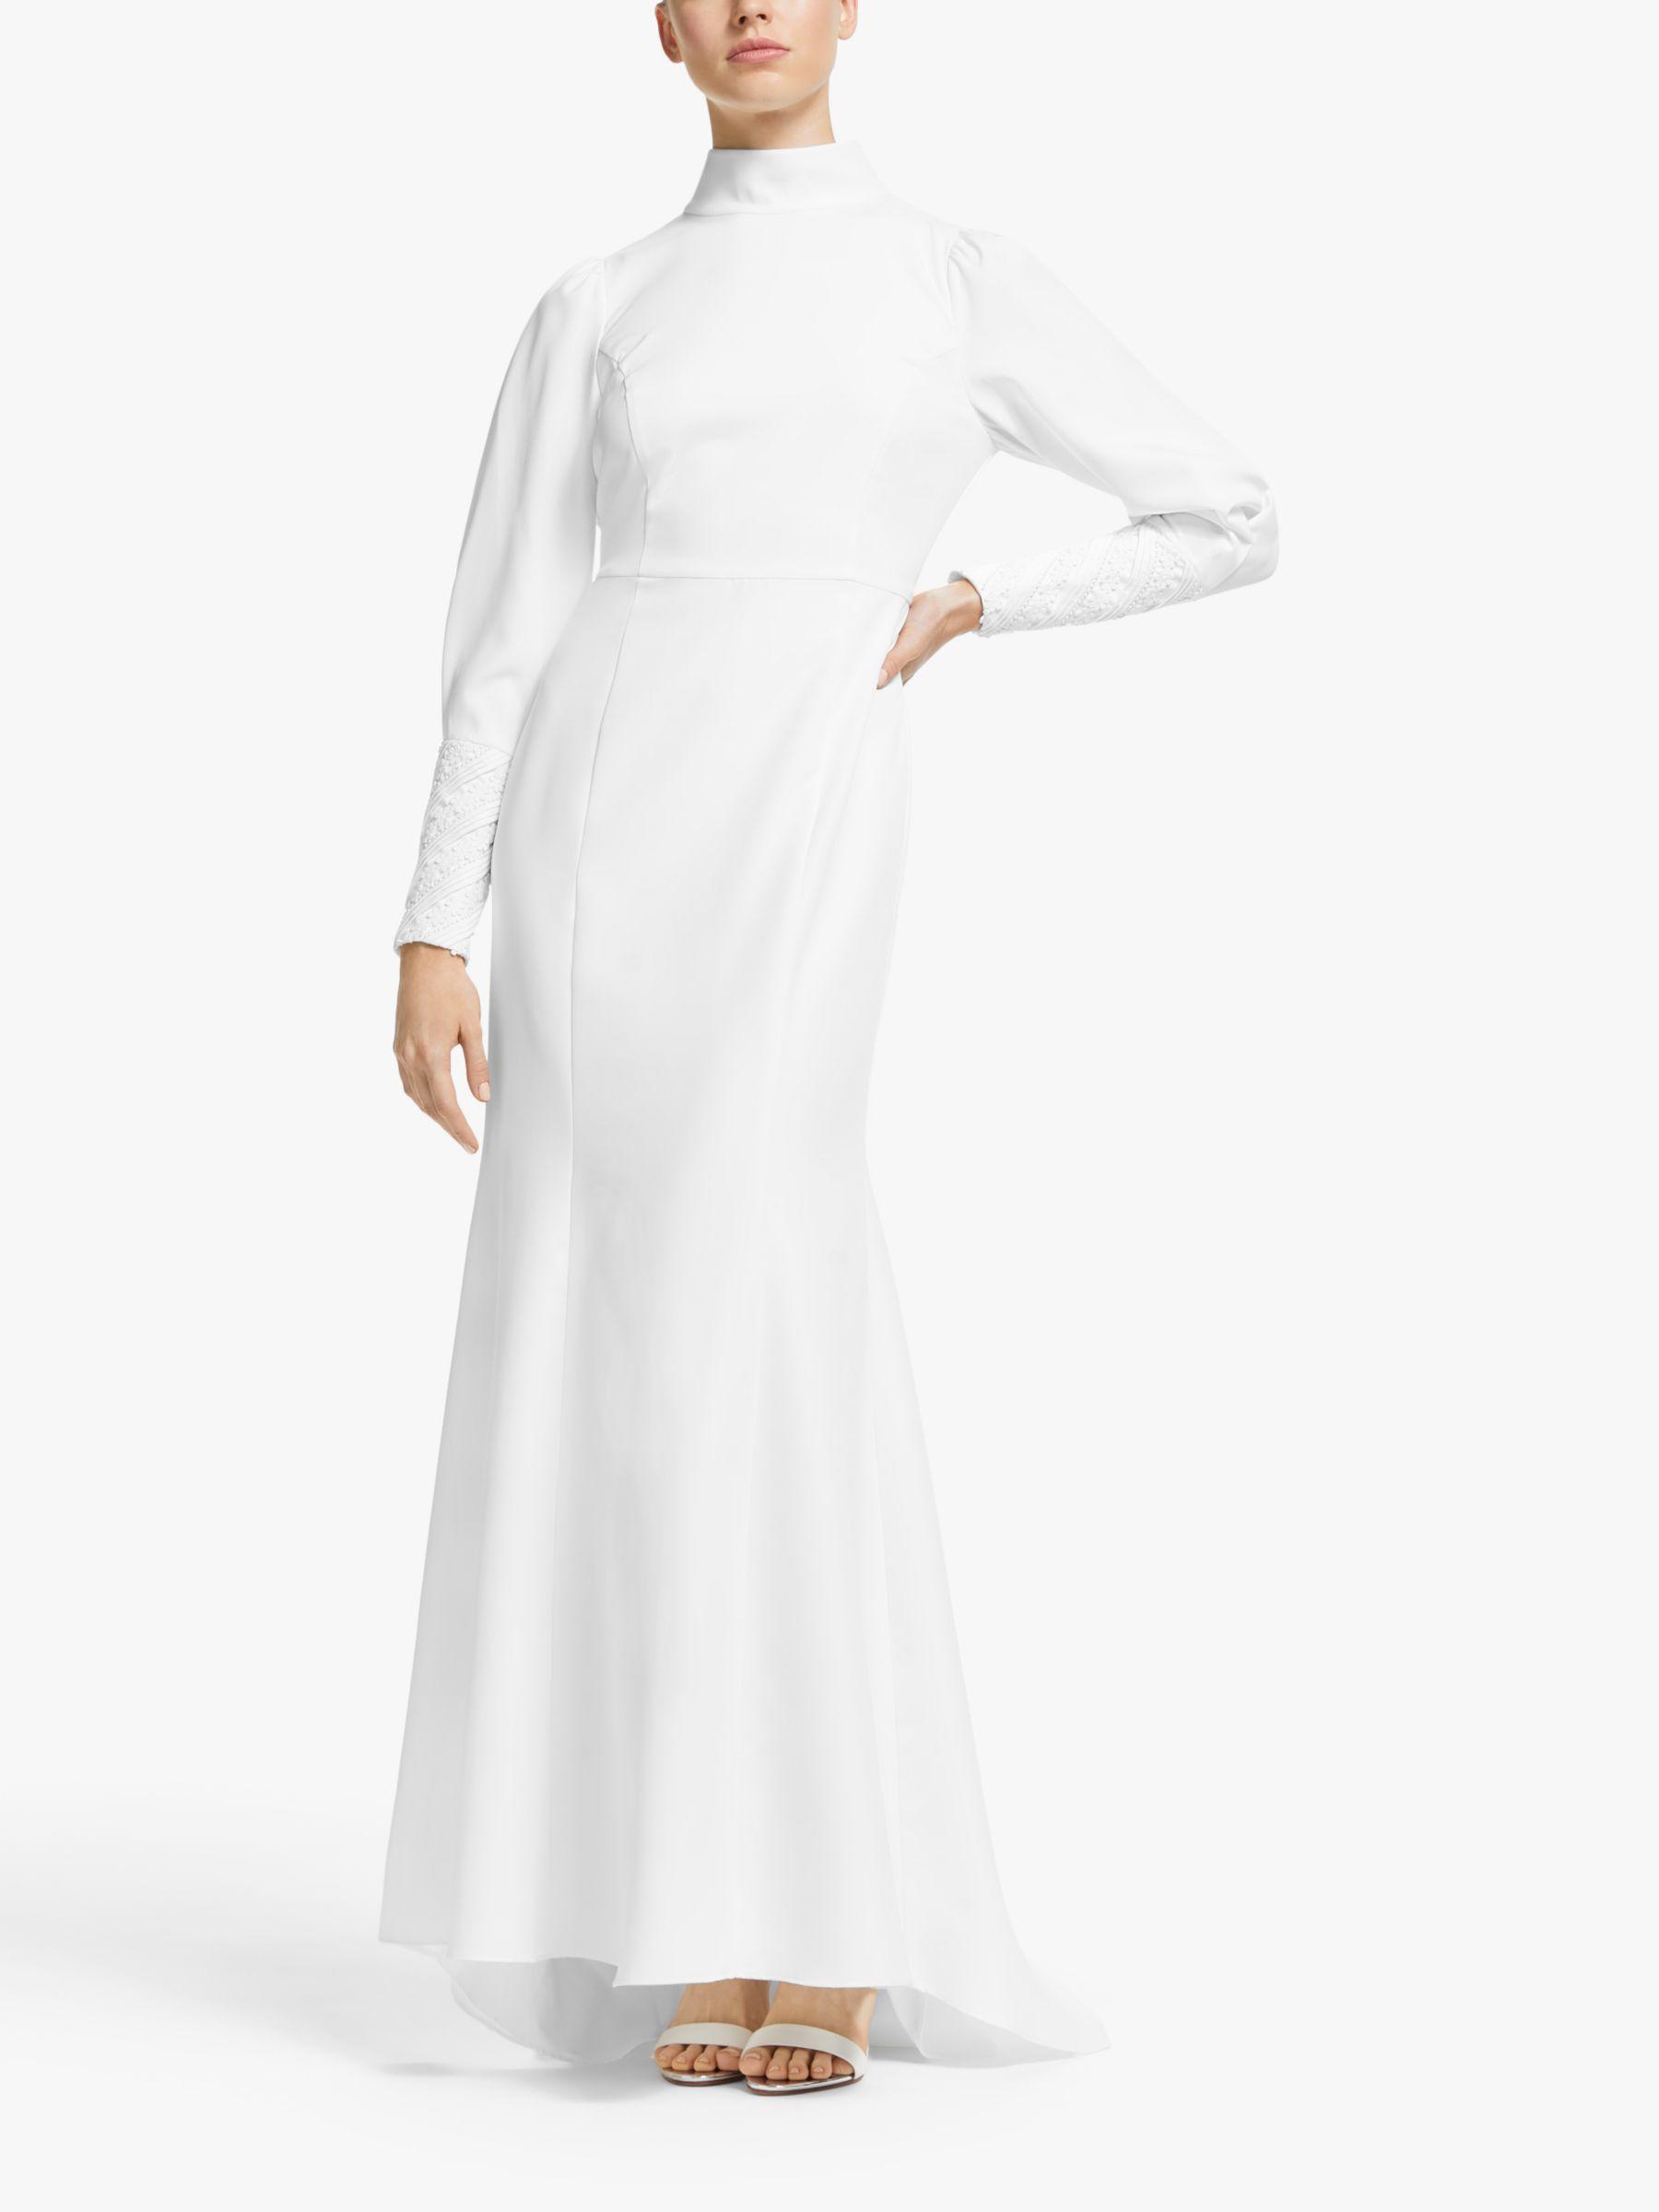 Y.a.s Y.A.S Patricia Maxi Dress, Star White